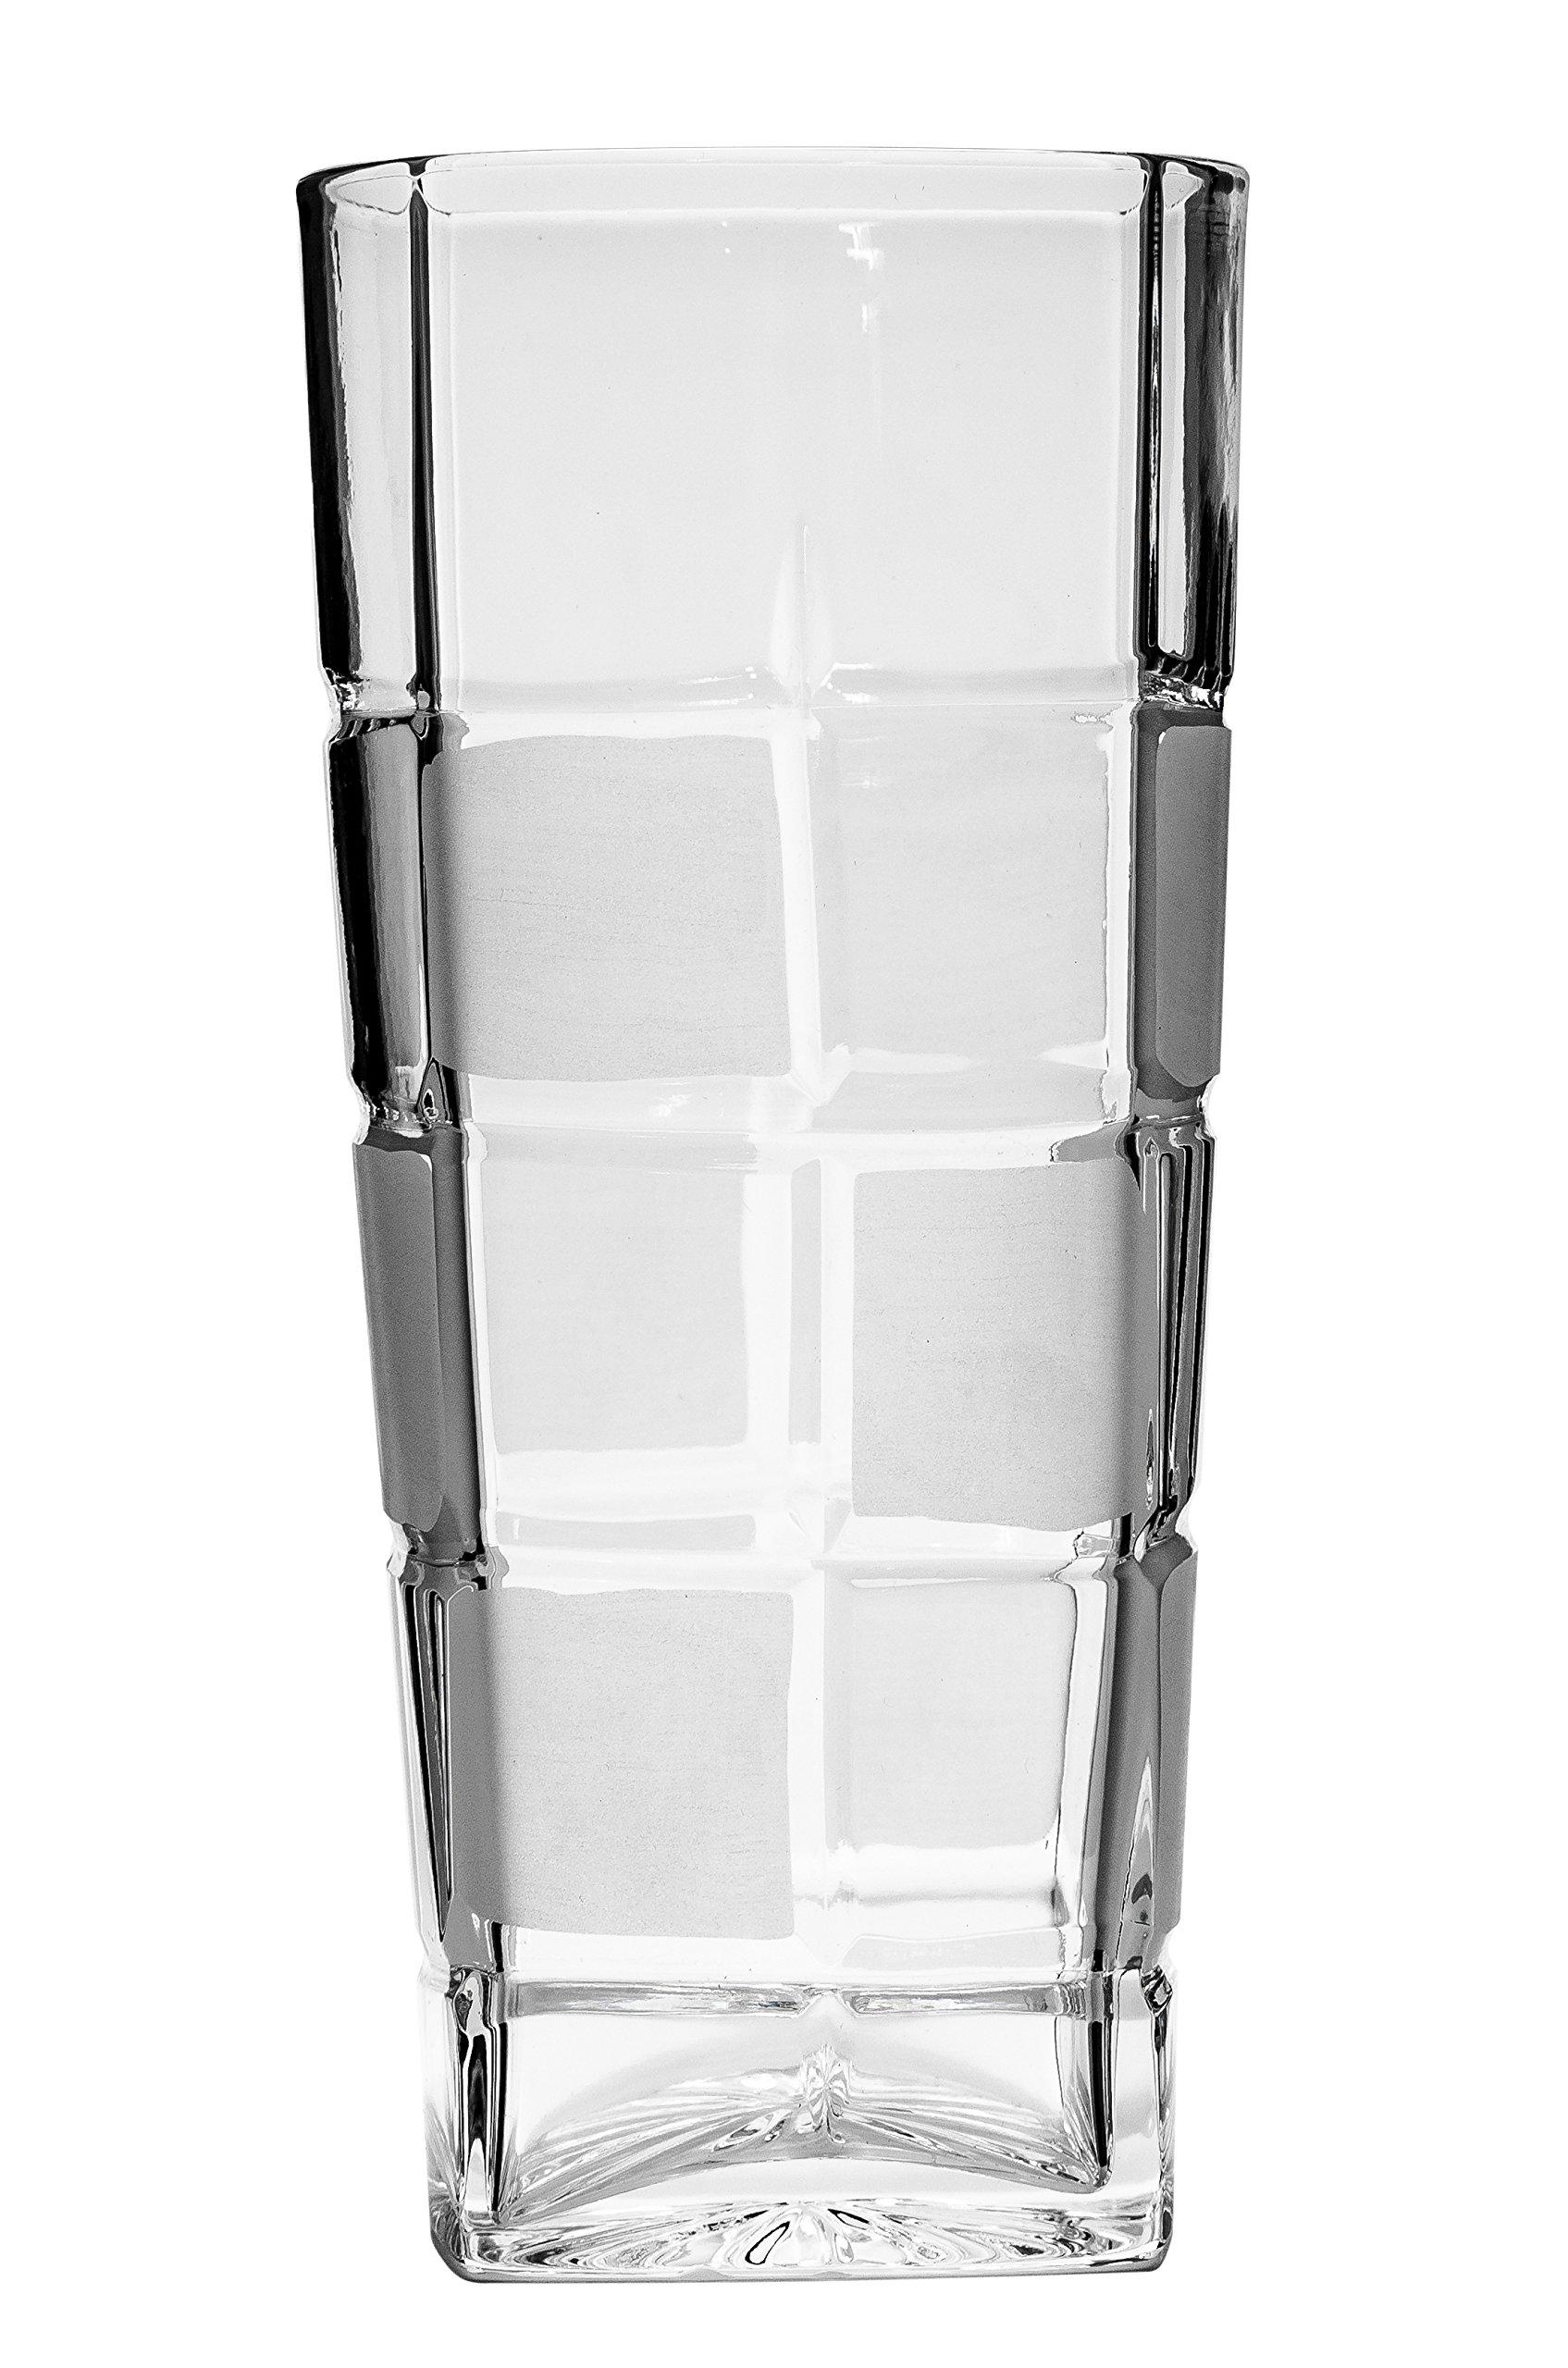 Neman GL8016, 10 Oz. Hand-Made Crystal Highball Cocktail Glasses, High Vintage Water Juice Beverage Glasses, Wedding Drinkware, Set of 6